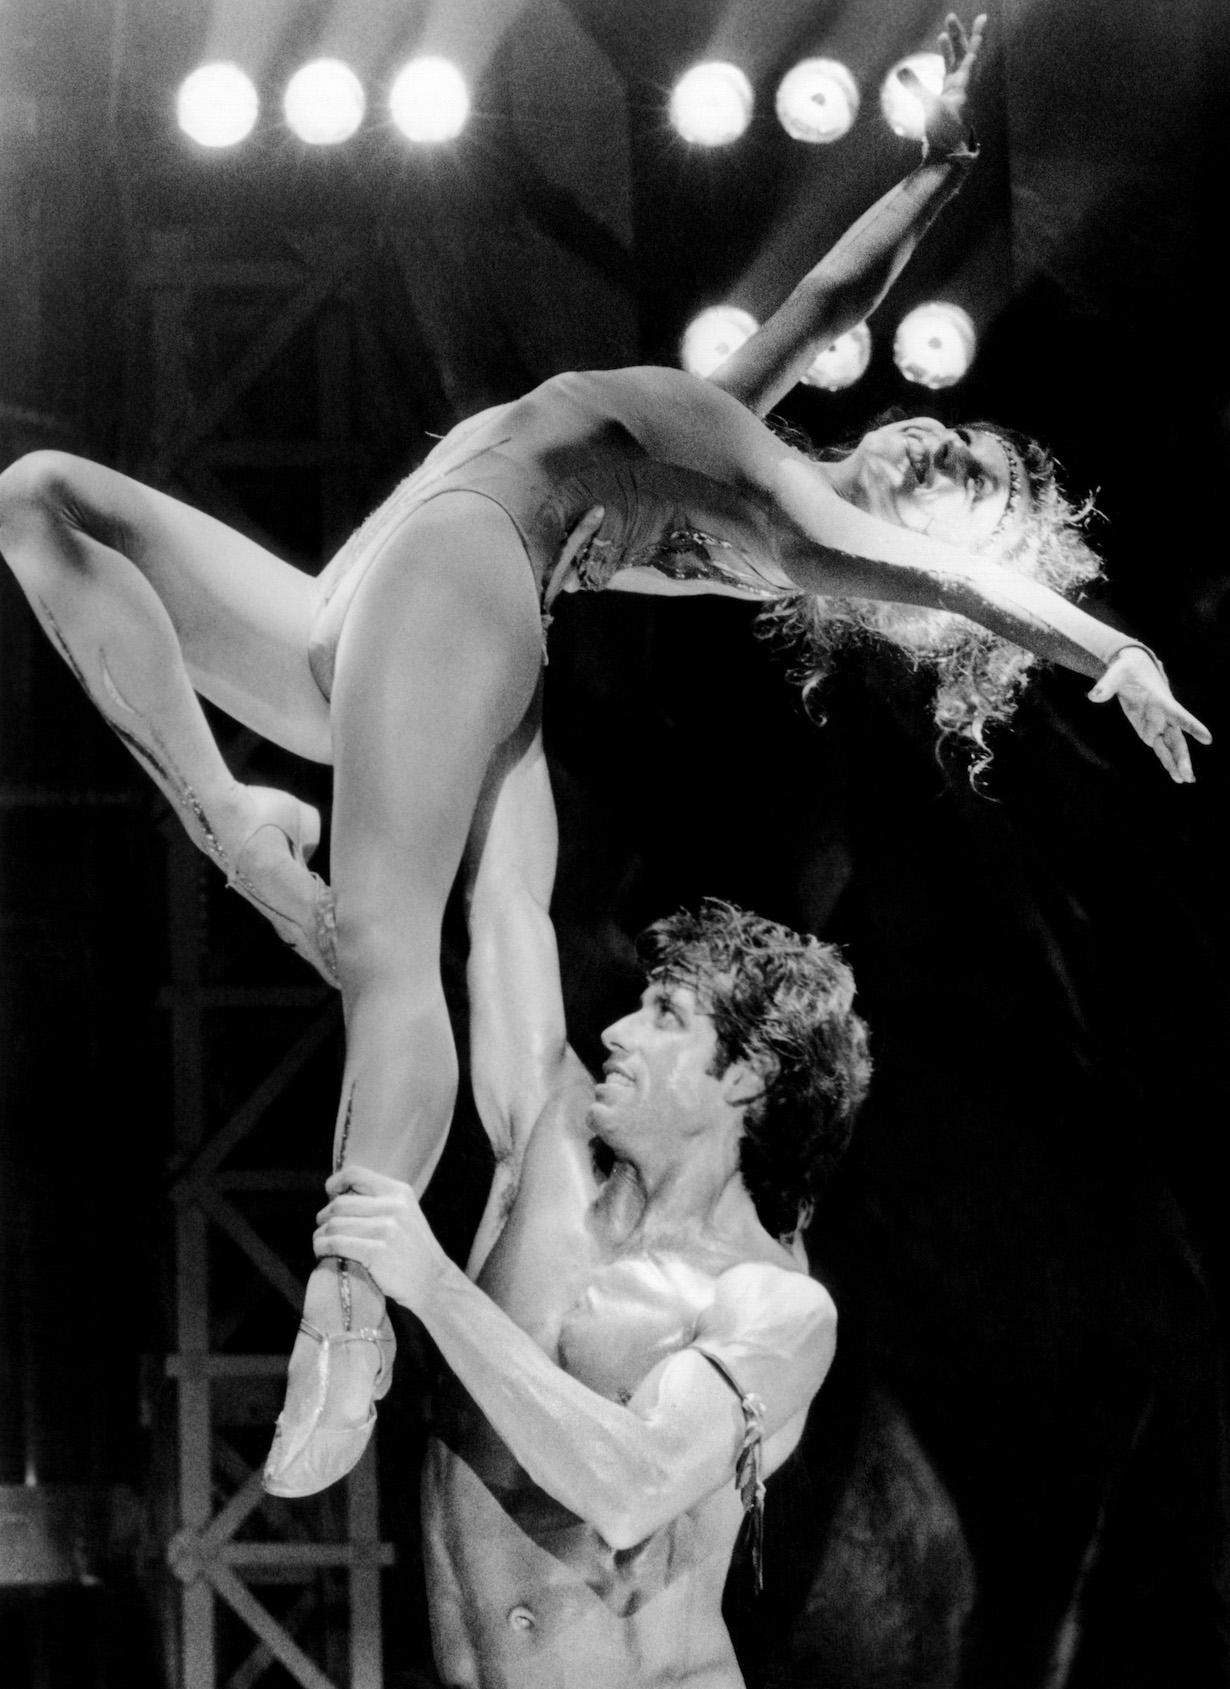 STAYING ALIVE, John Travolta, lifting Finola Hughes, 1983, ©Paramount/courtesy Everett Collection